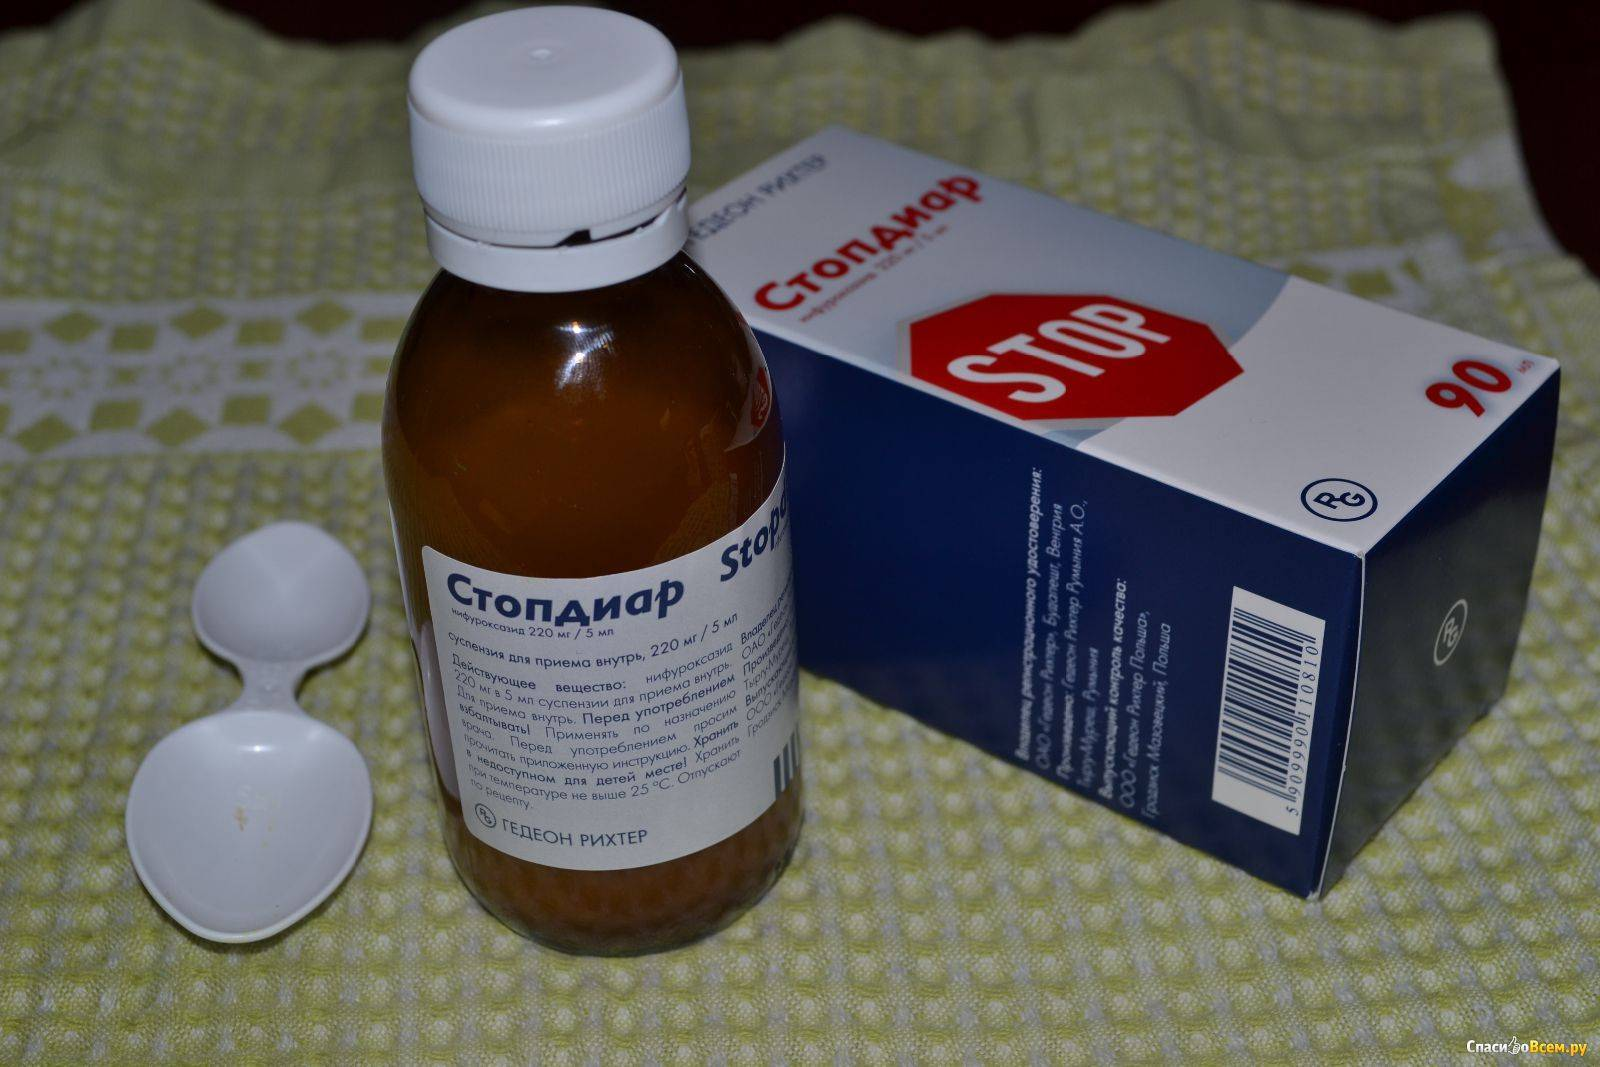 Лекарства от поноса для детей: таблетки, суспензии, антибиотики и другие препараты против диареи